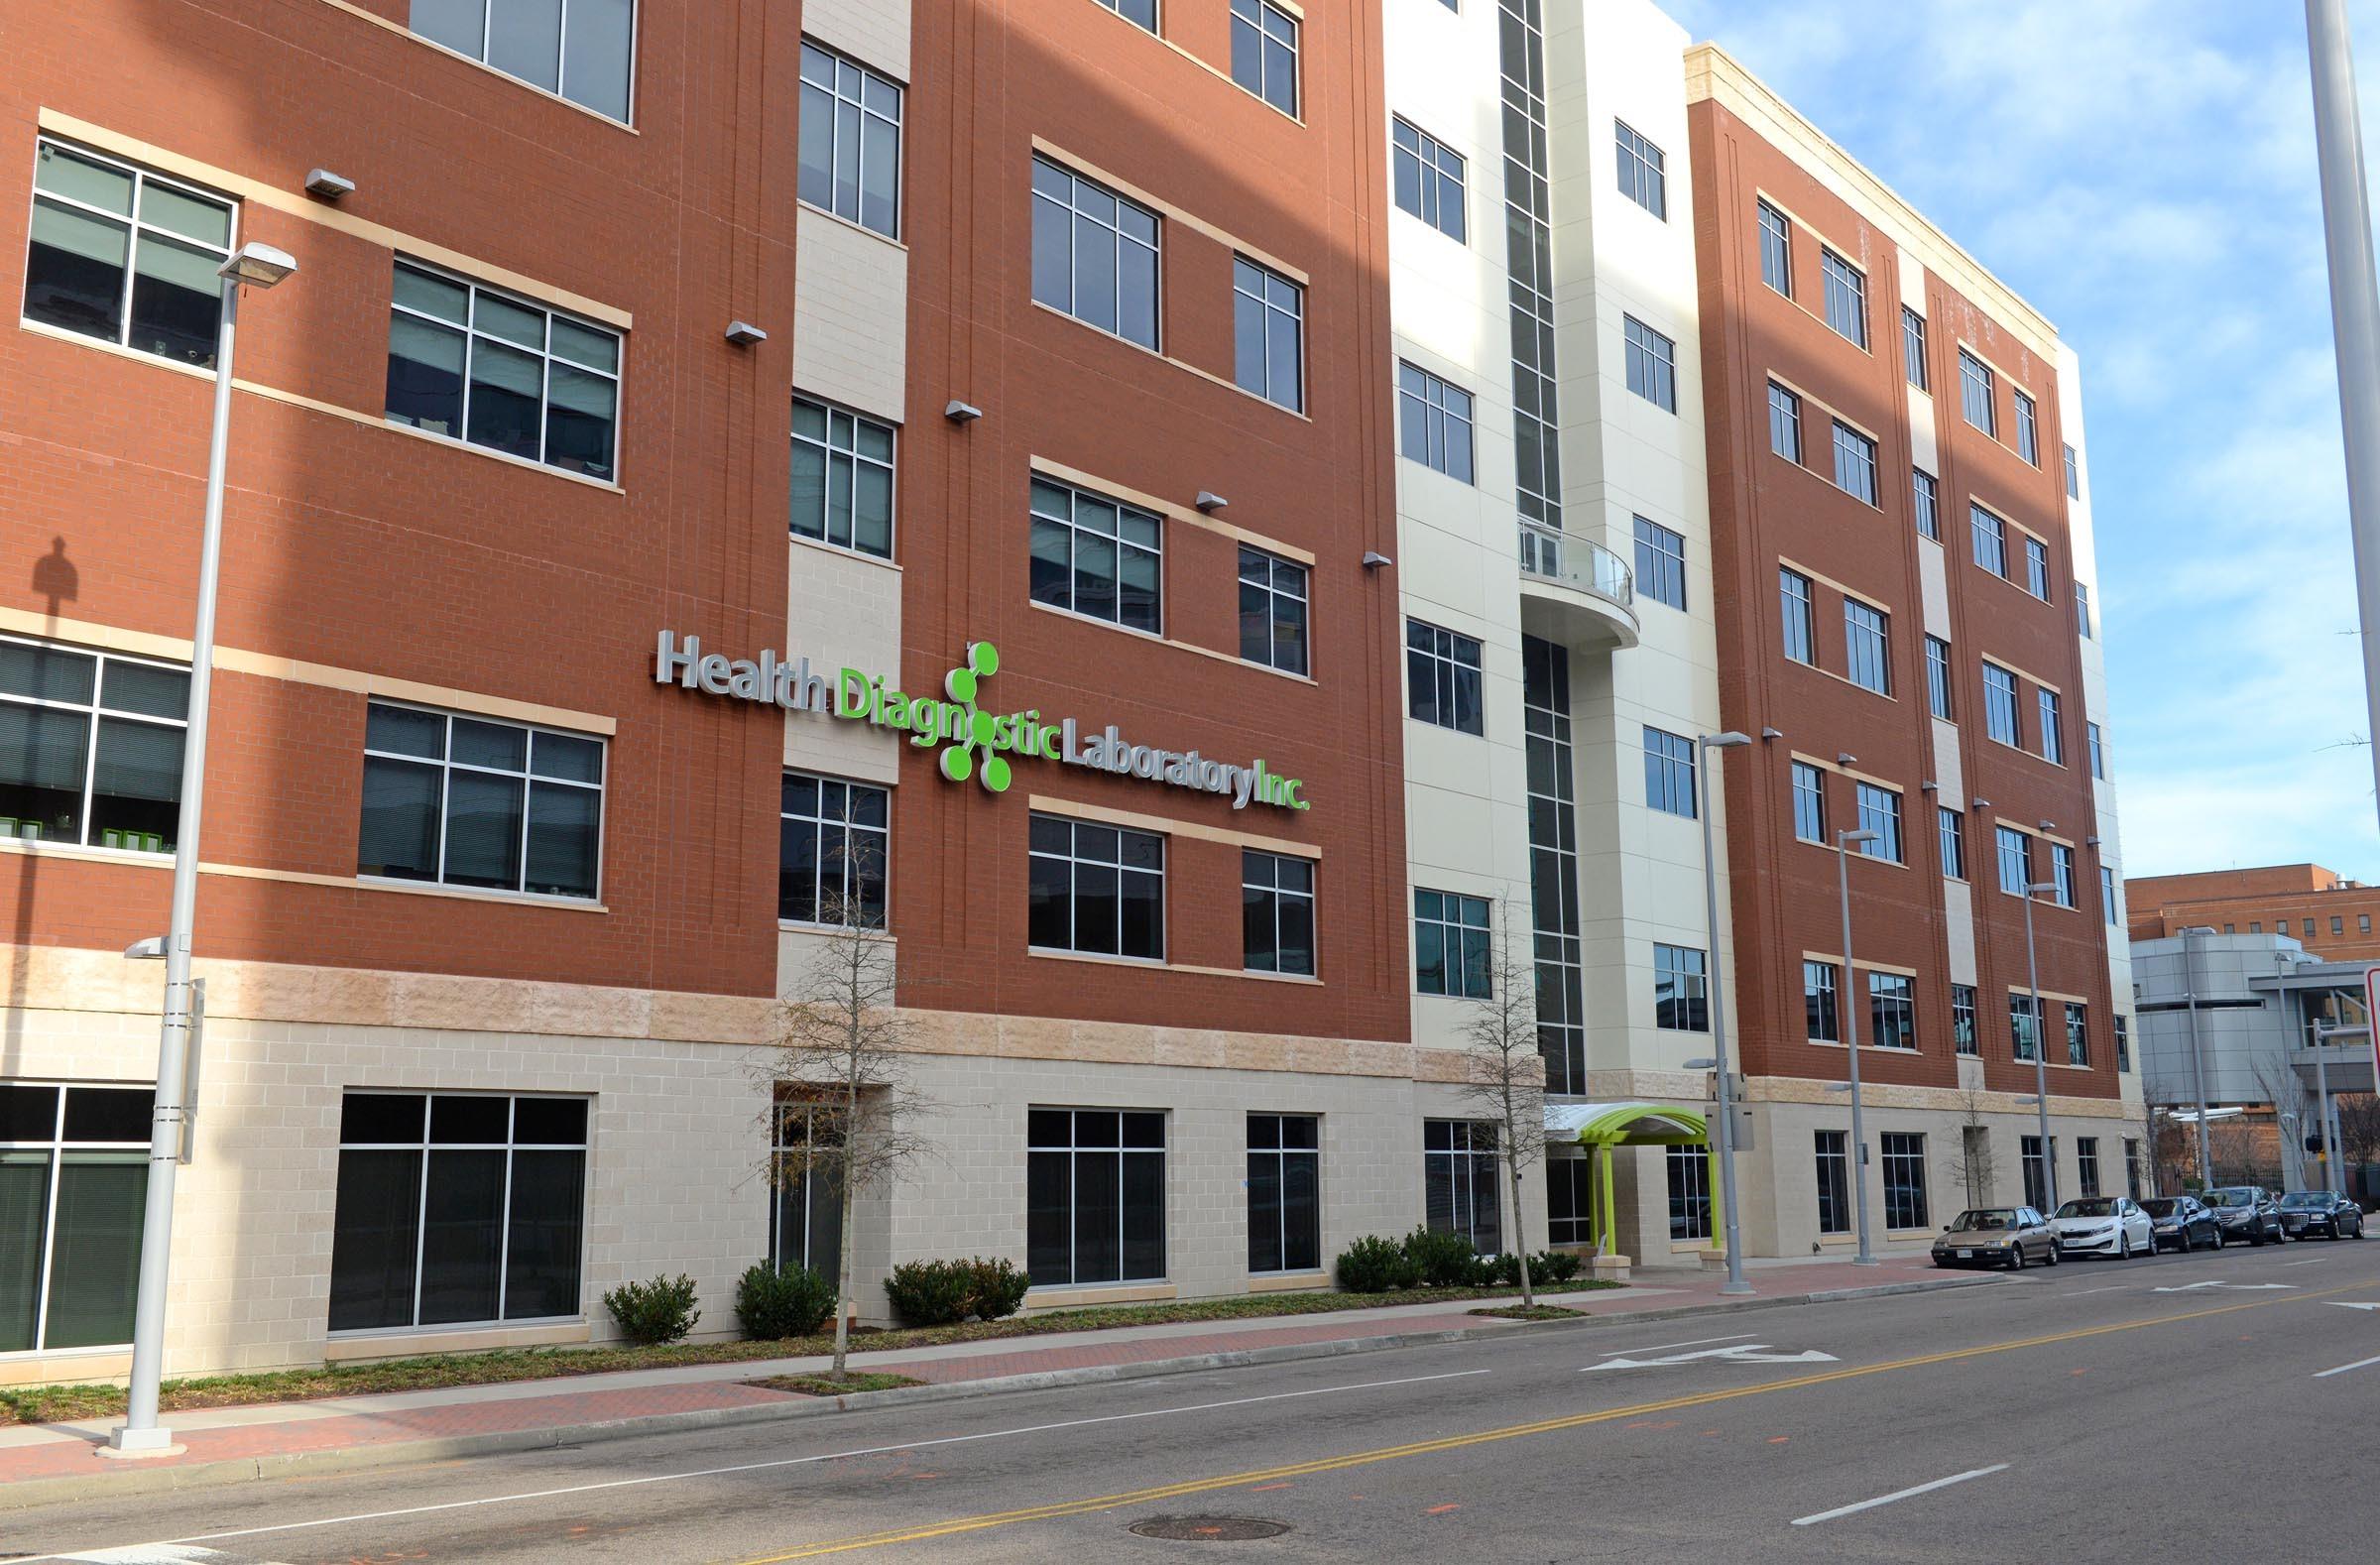 Health Diagnostic Laboratory's new headquarters at 737 N. Fifth Street cost $100 million. - SCOTT ELMQUIST